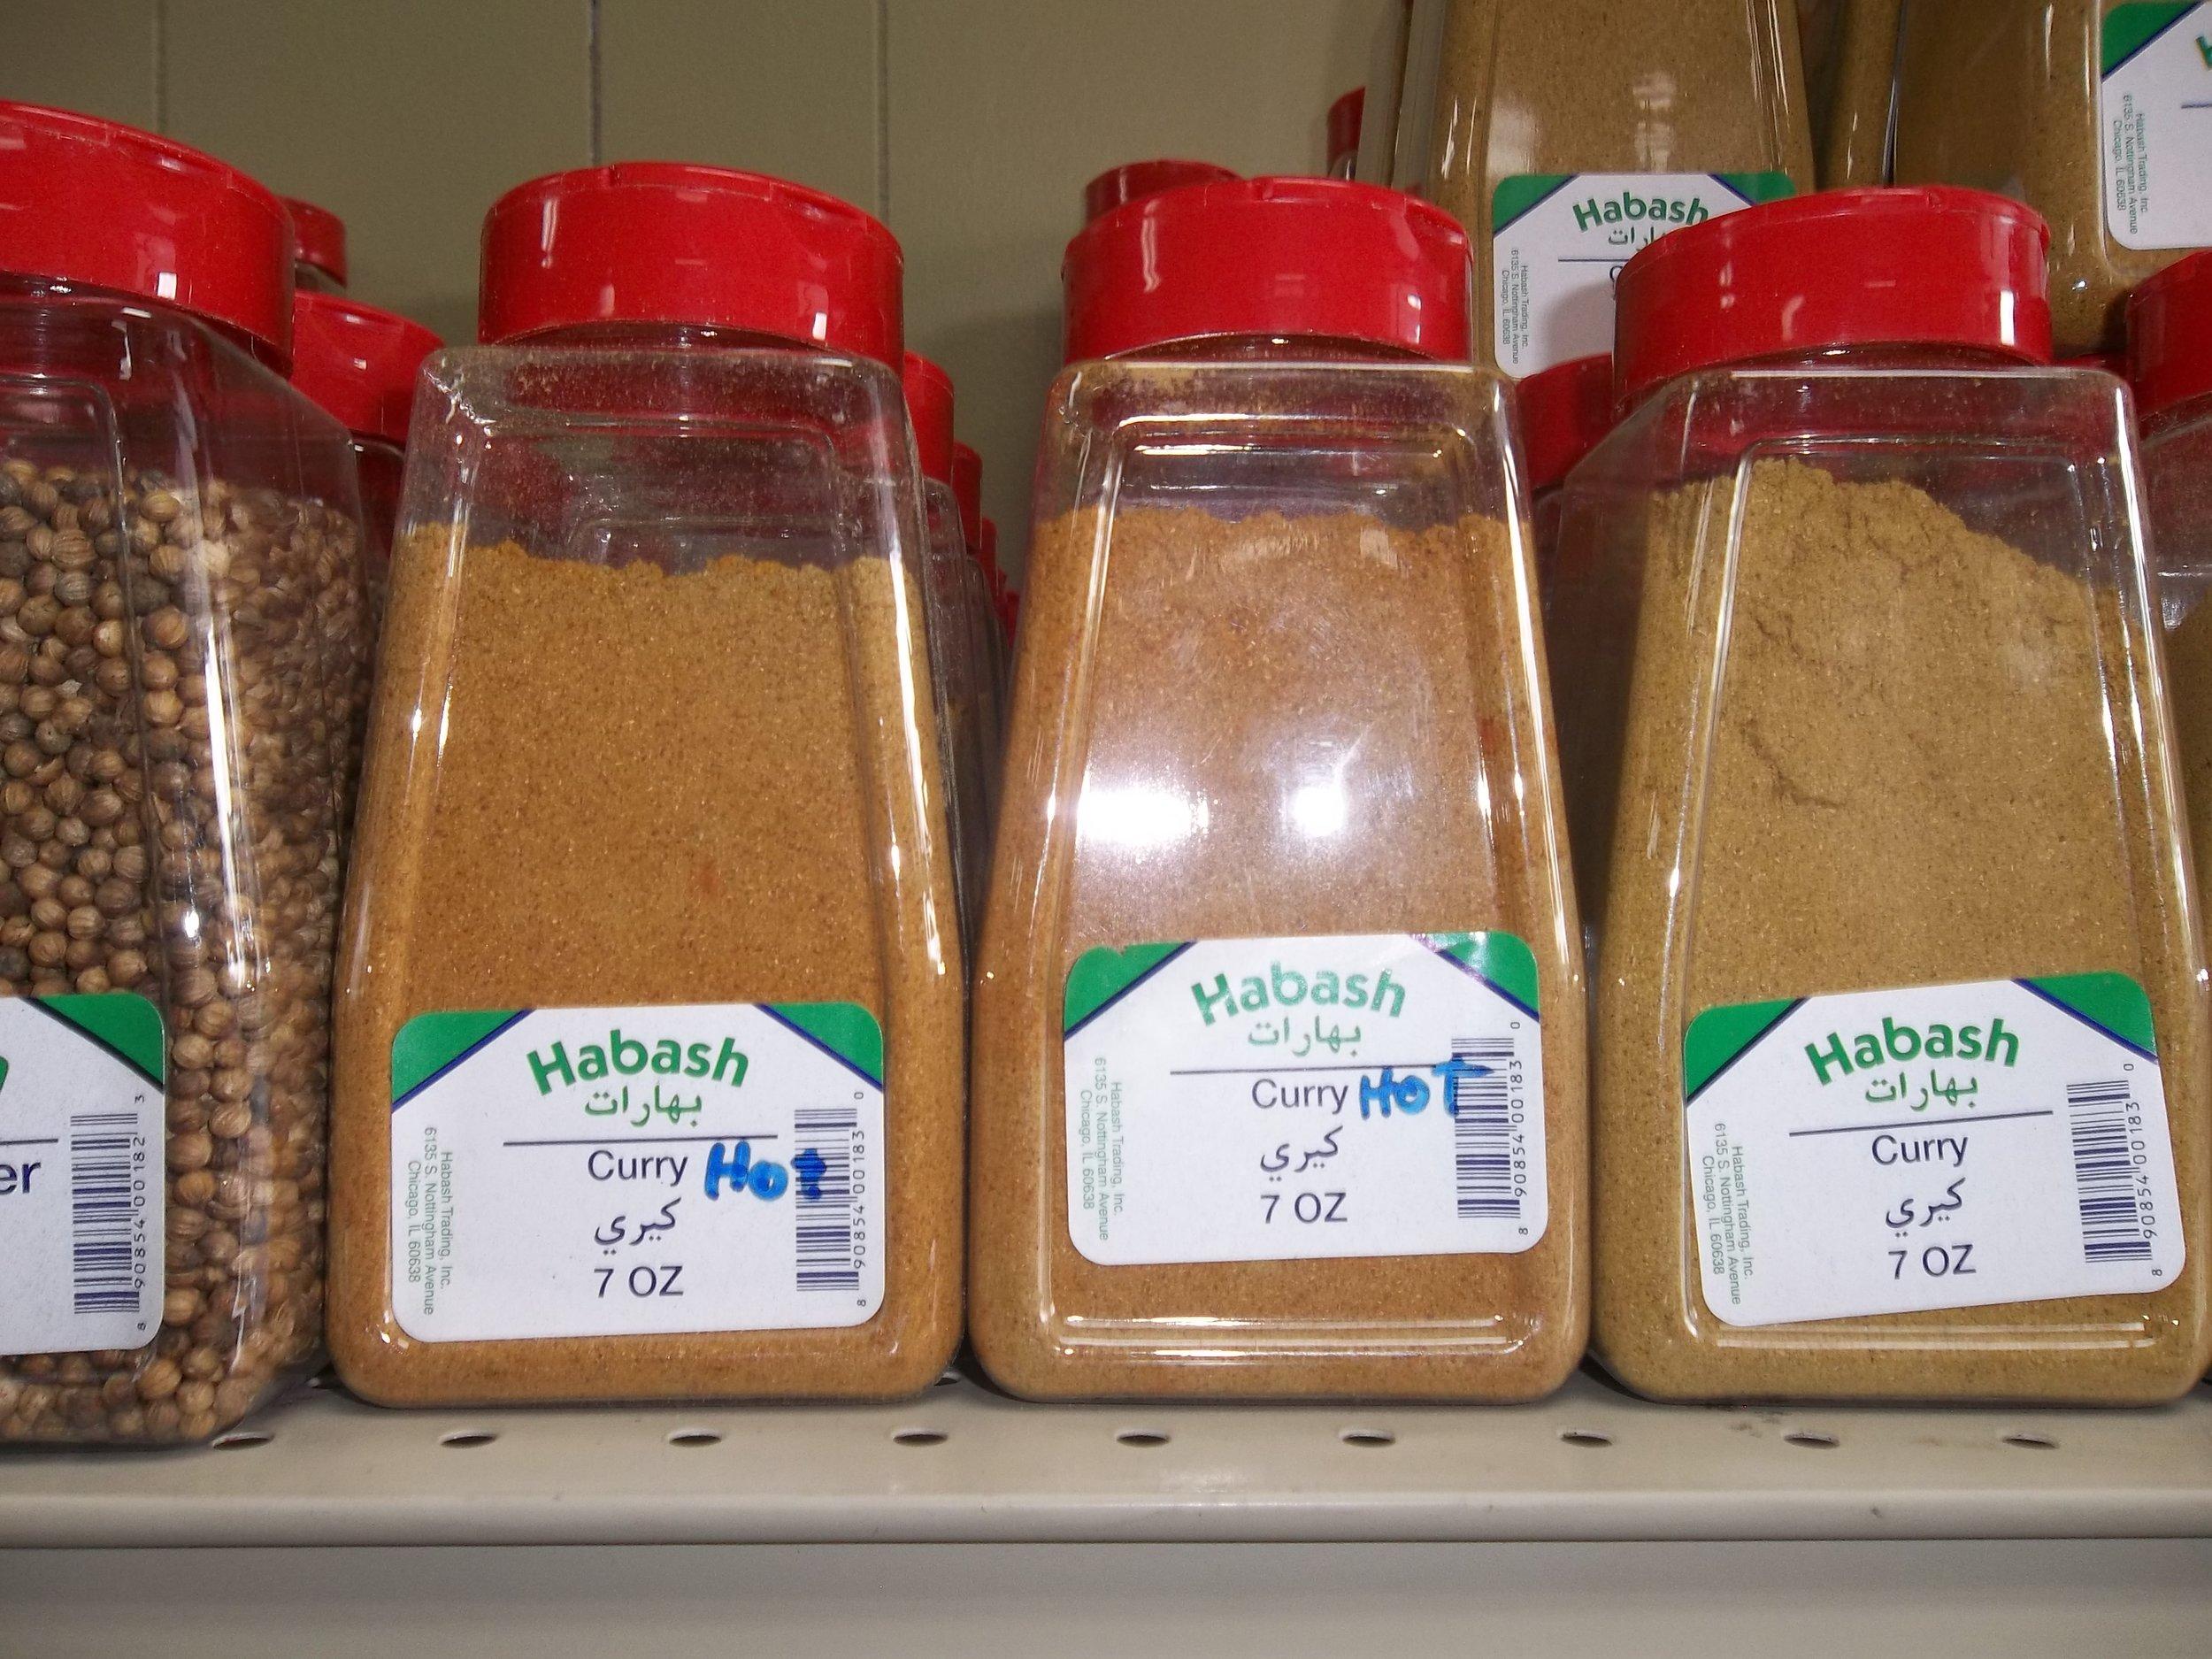 Spice-Store-Pak-Halal-12259-W-87th-St-Parkway-Lenexa-KS-66215.JPG